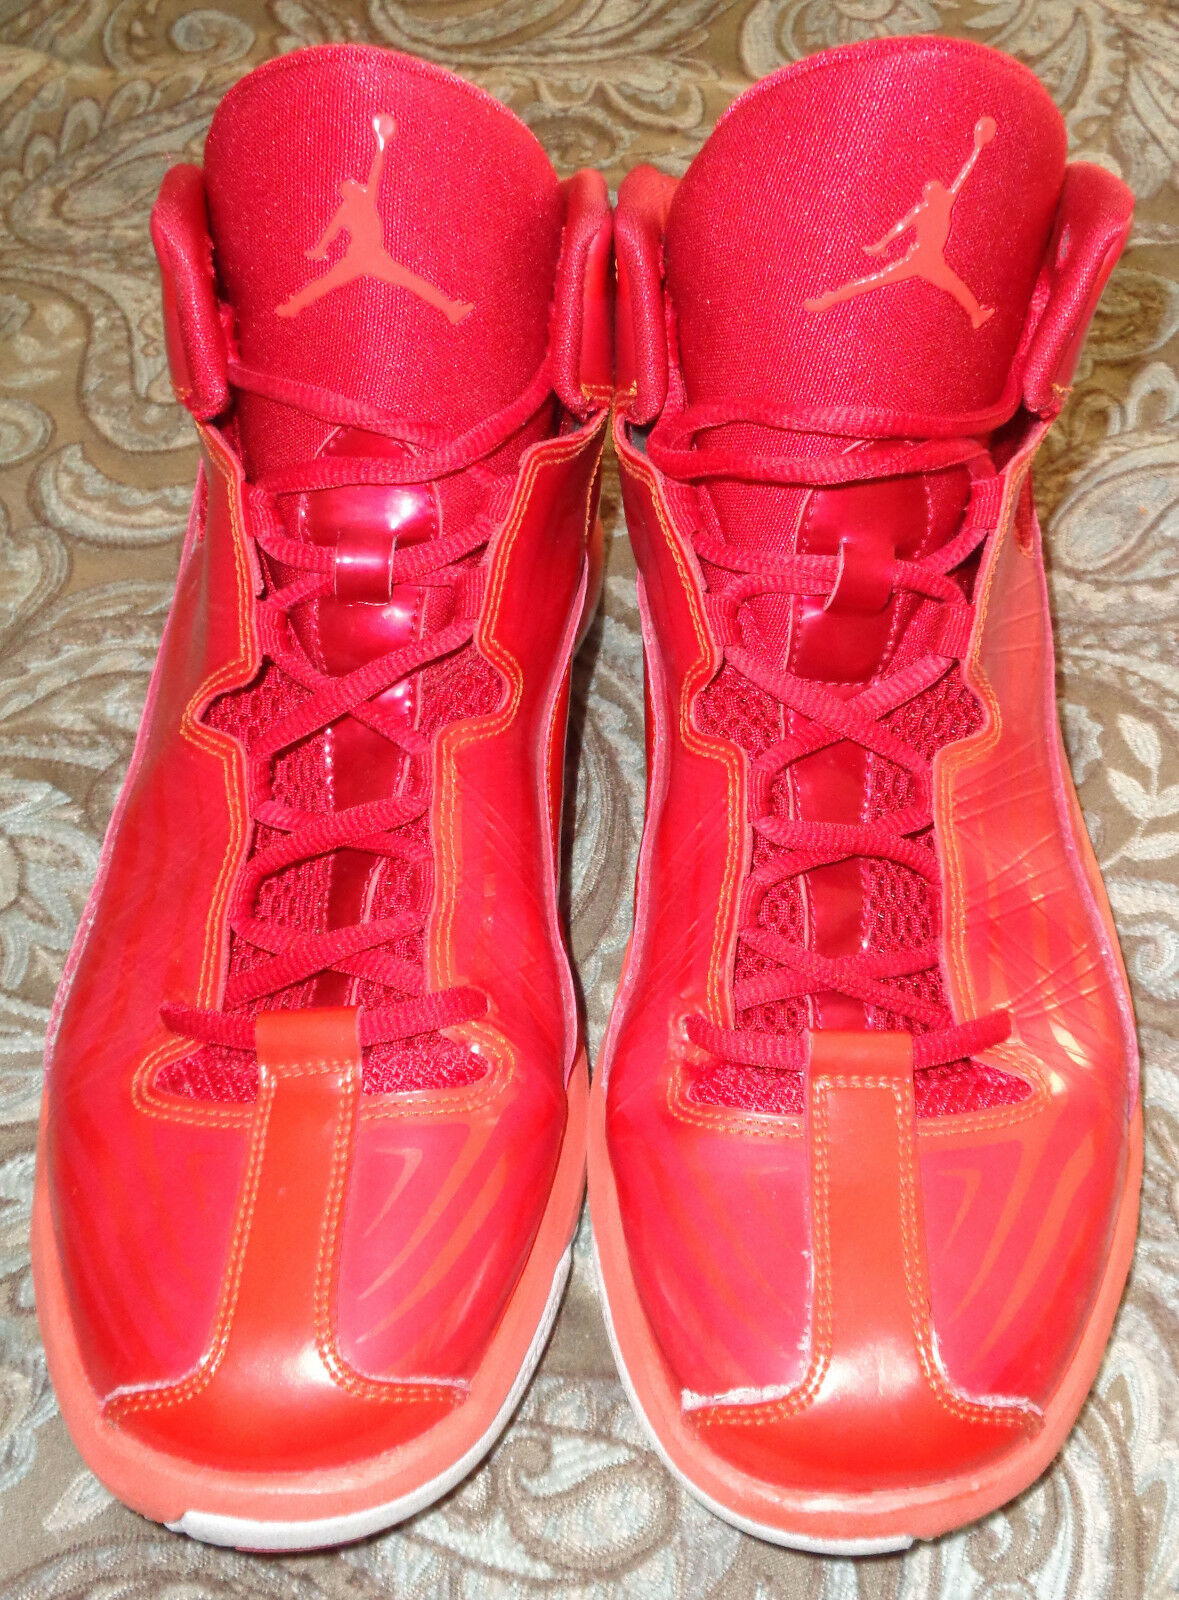 flywire utilisé nike bright jordan aero mania gym rouge / blanc bright nike crimson chaussures taille 10,5 f4445b